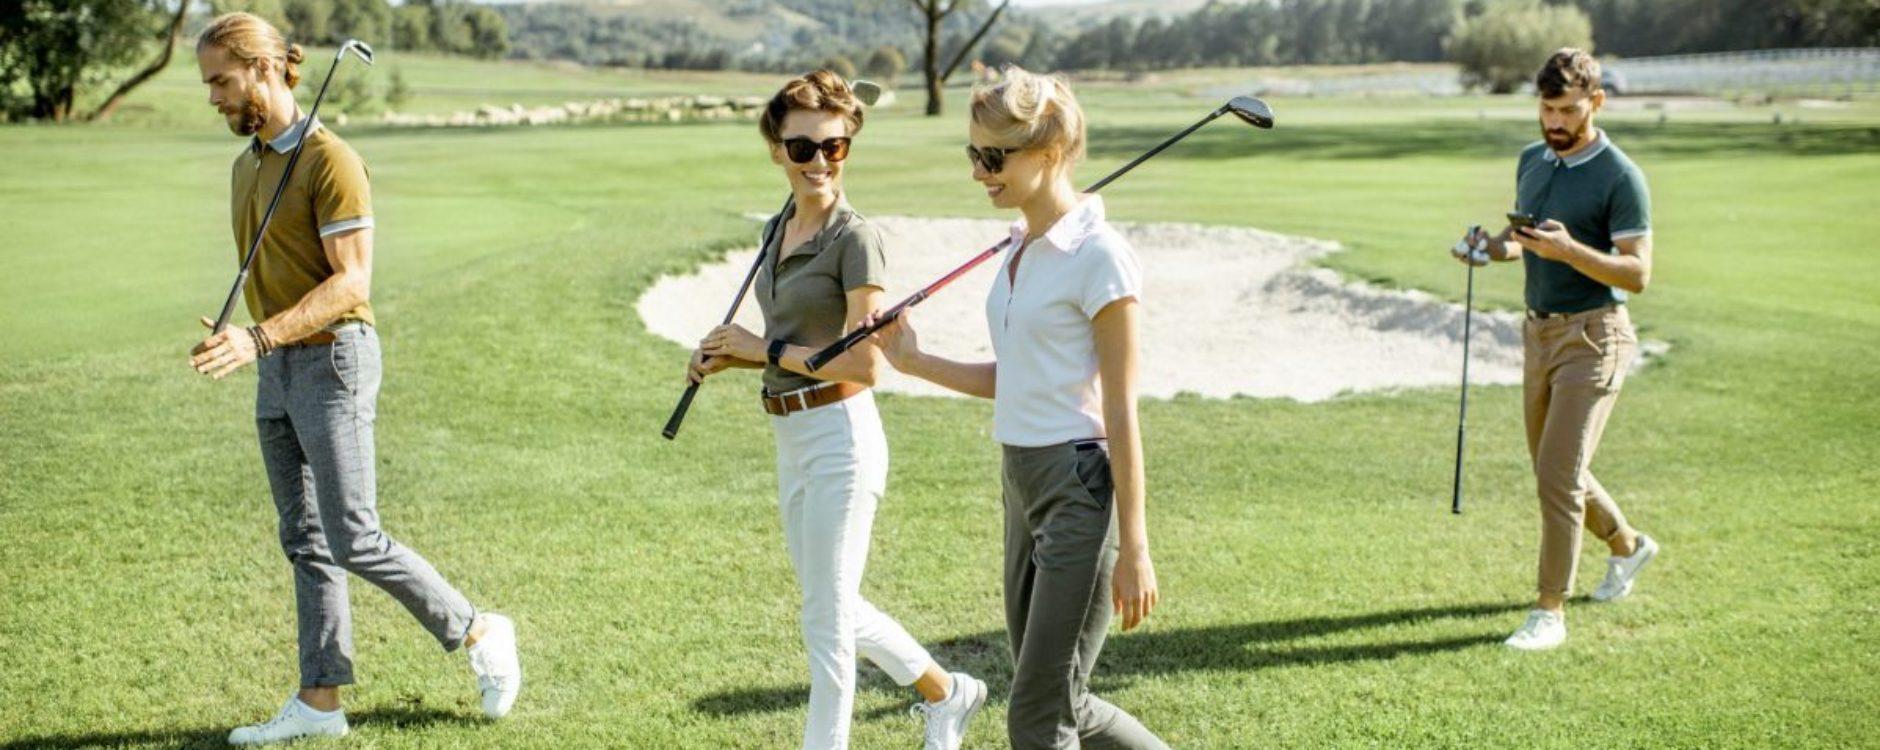 golfpro.berlin